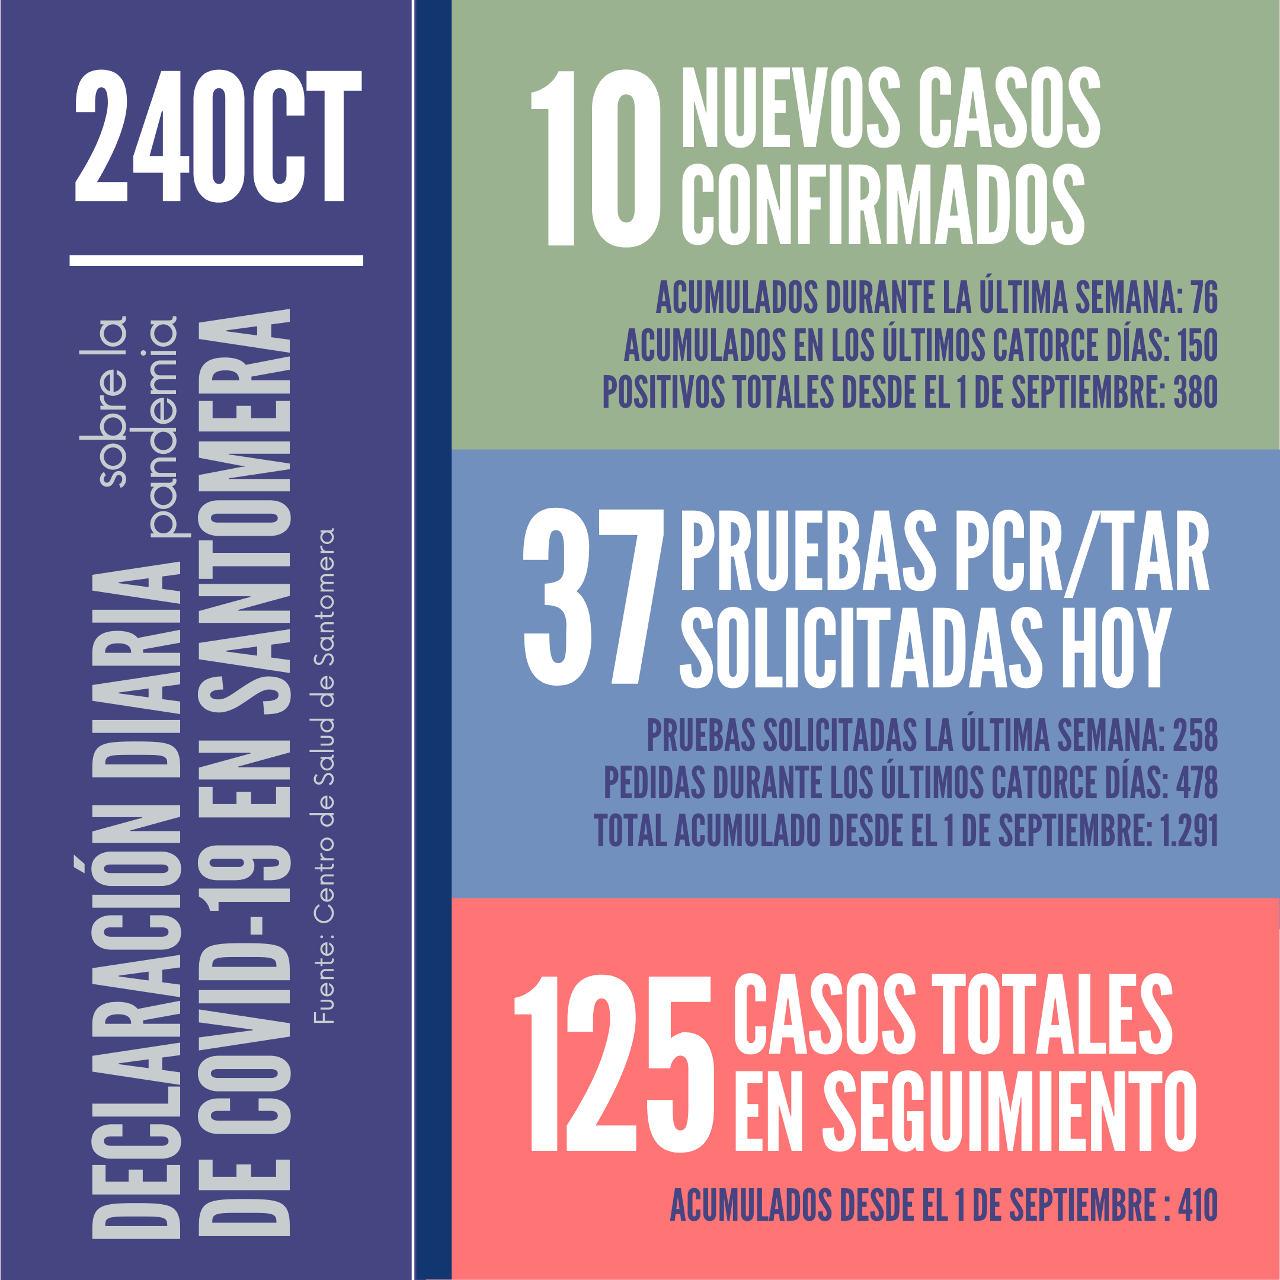 20201024_Datos COVID-19 Santomera